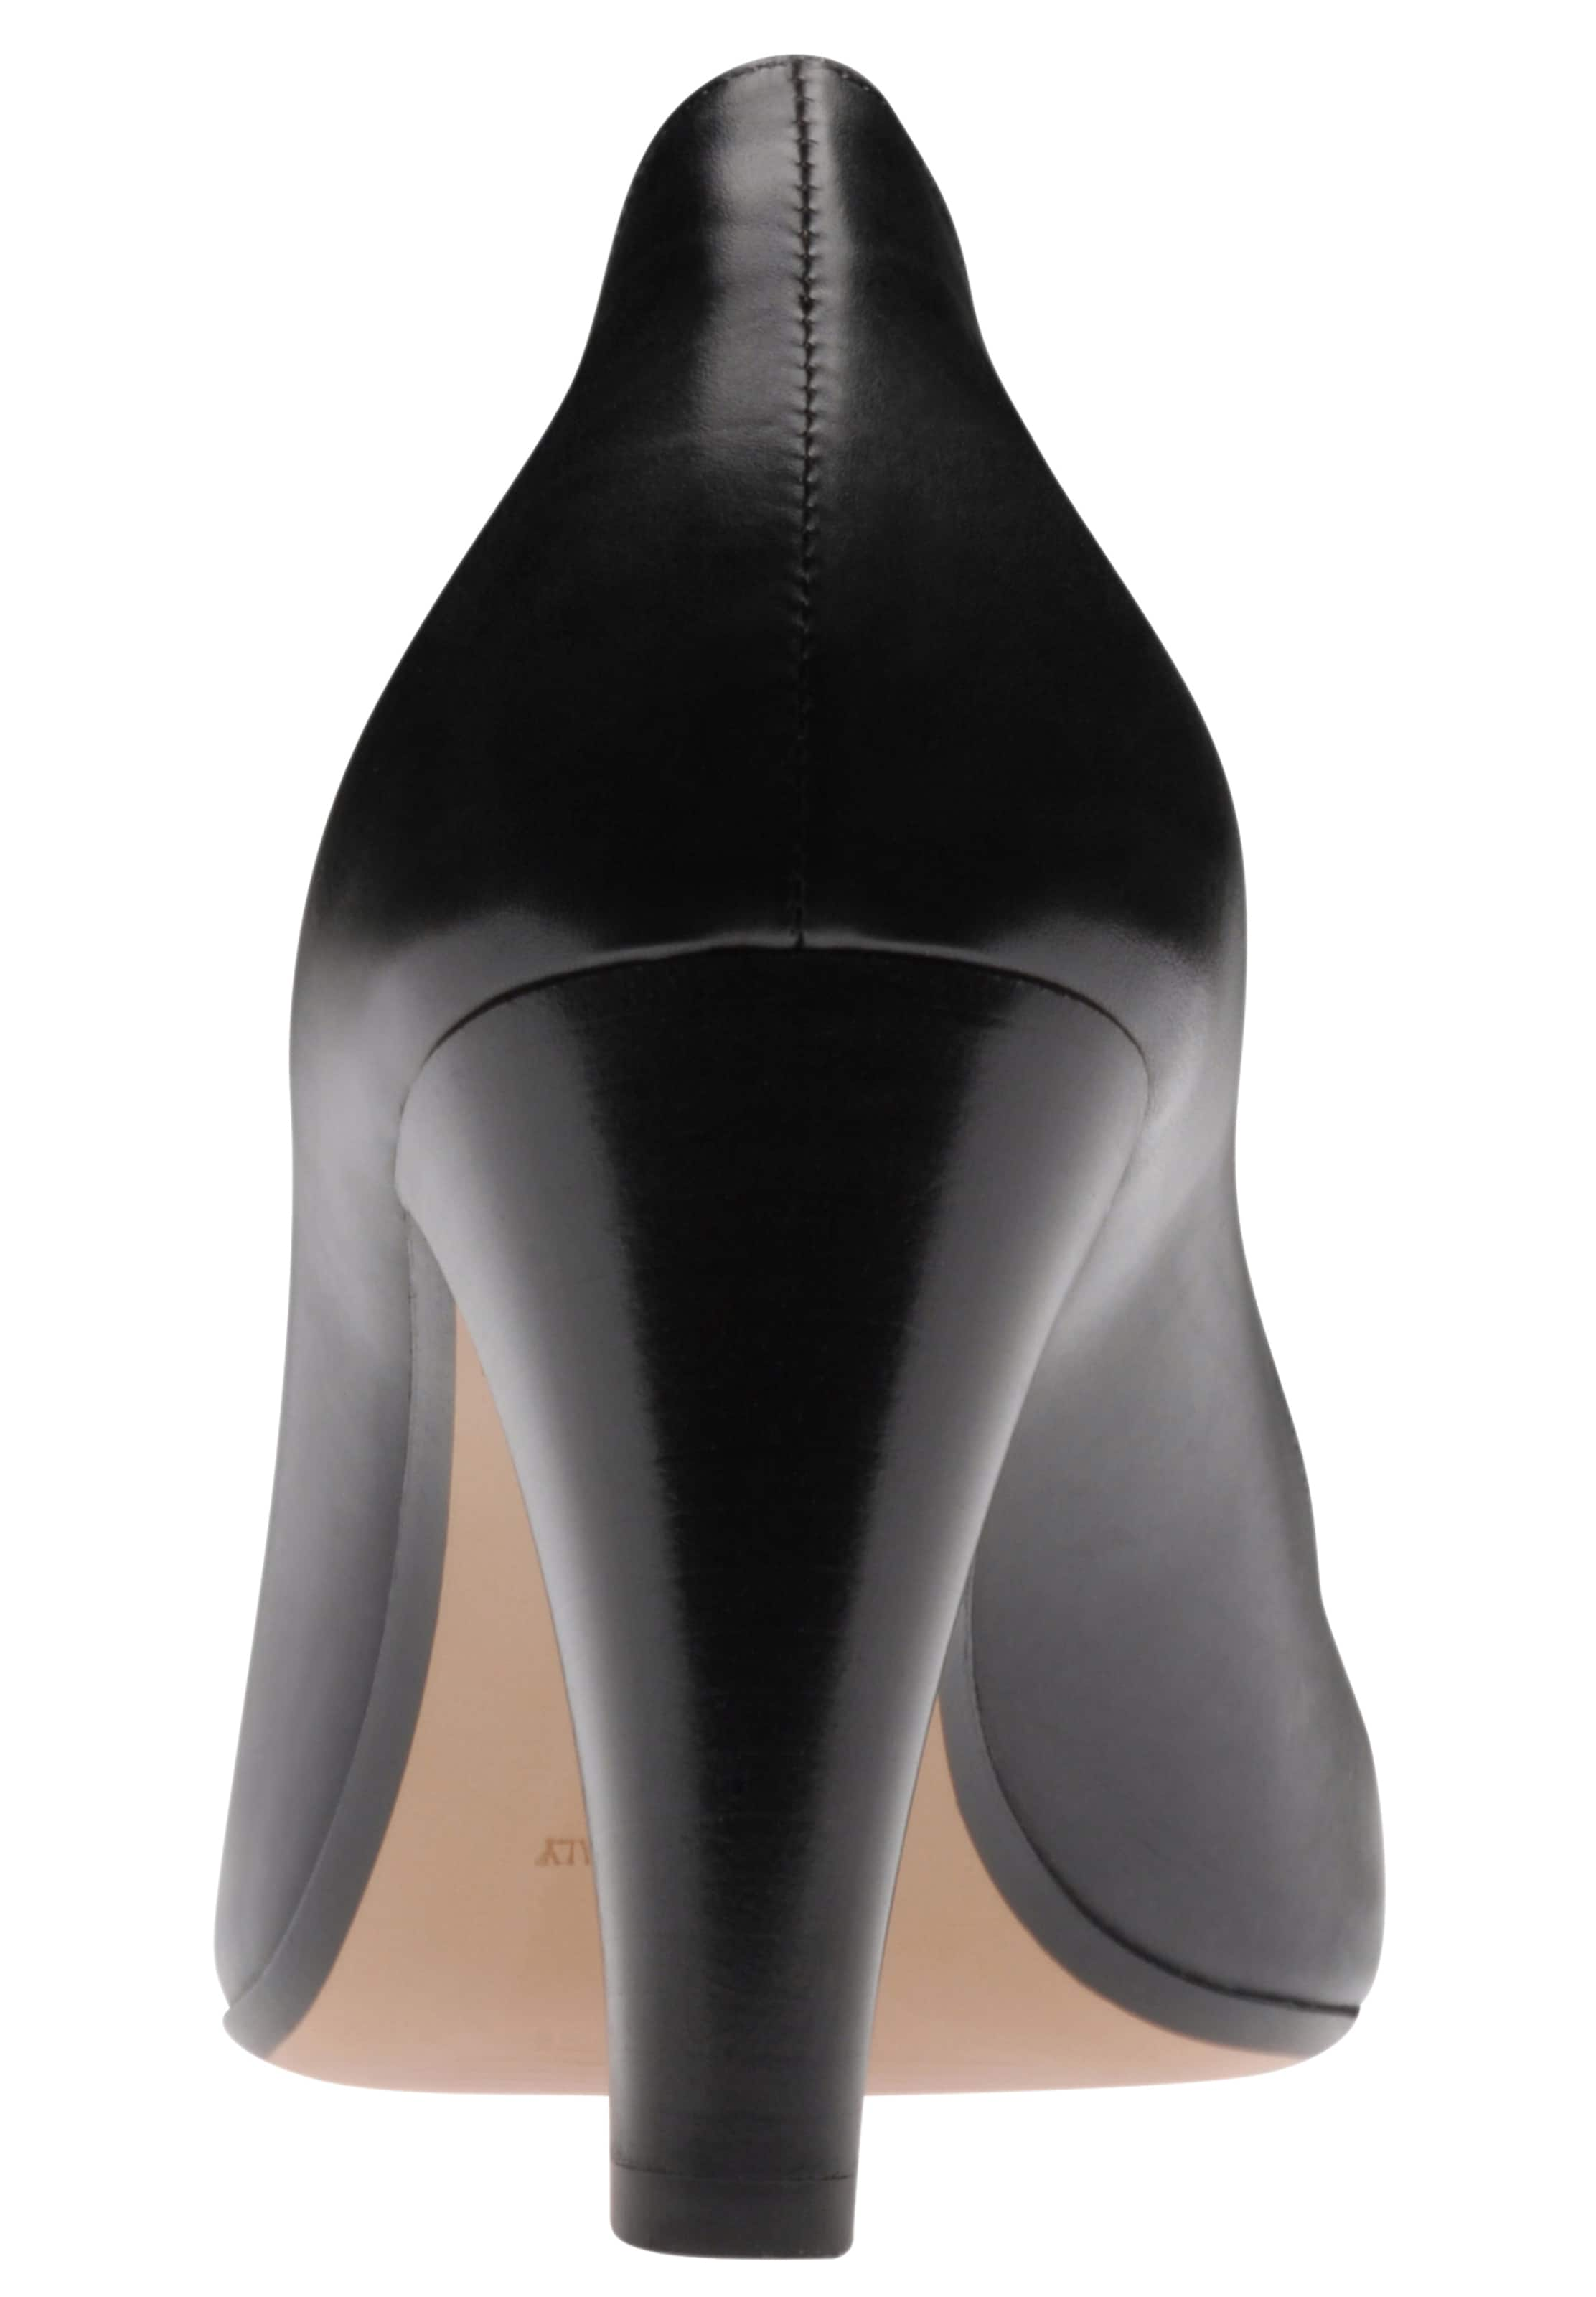 Evita Evita Escarpins Noir En Escarpins Noir Escarpins En En Evita Noir Evita XPZuik